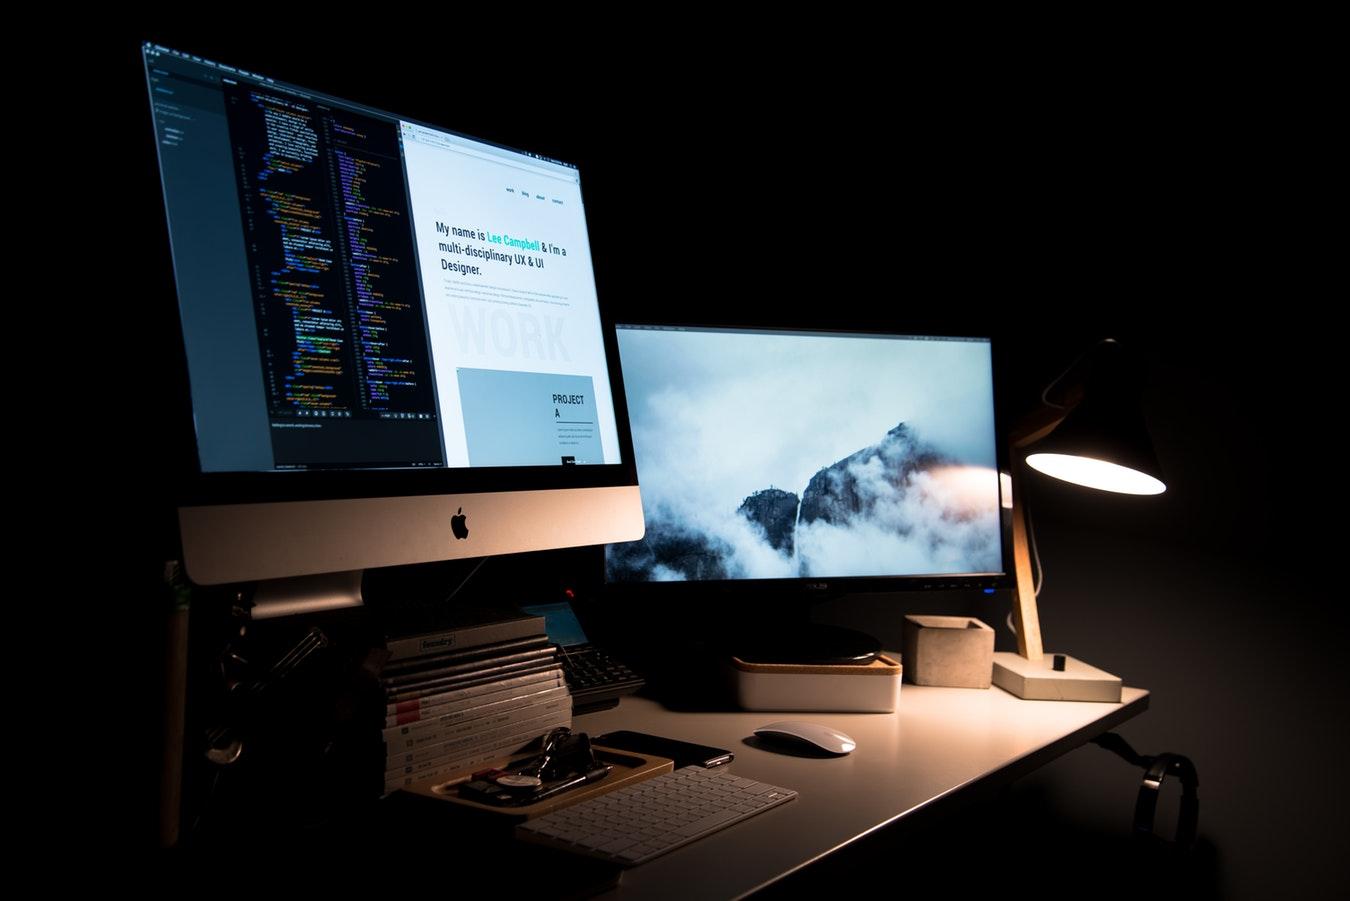 Hvis du vil overleve som designer, har du bare at lære programmering!